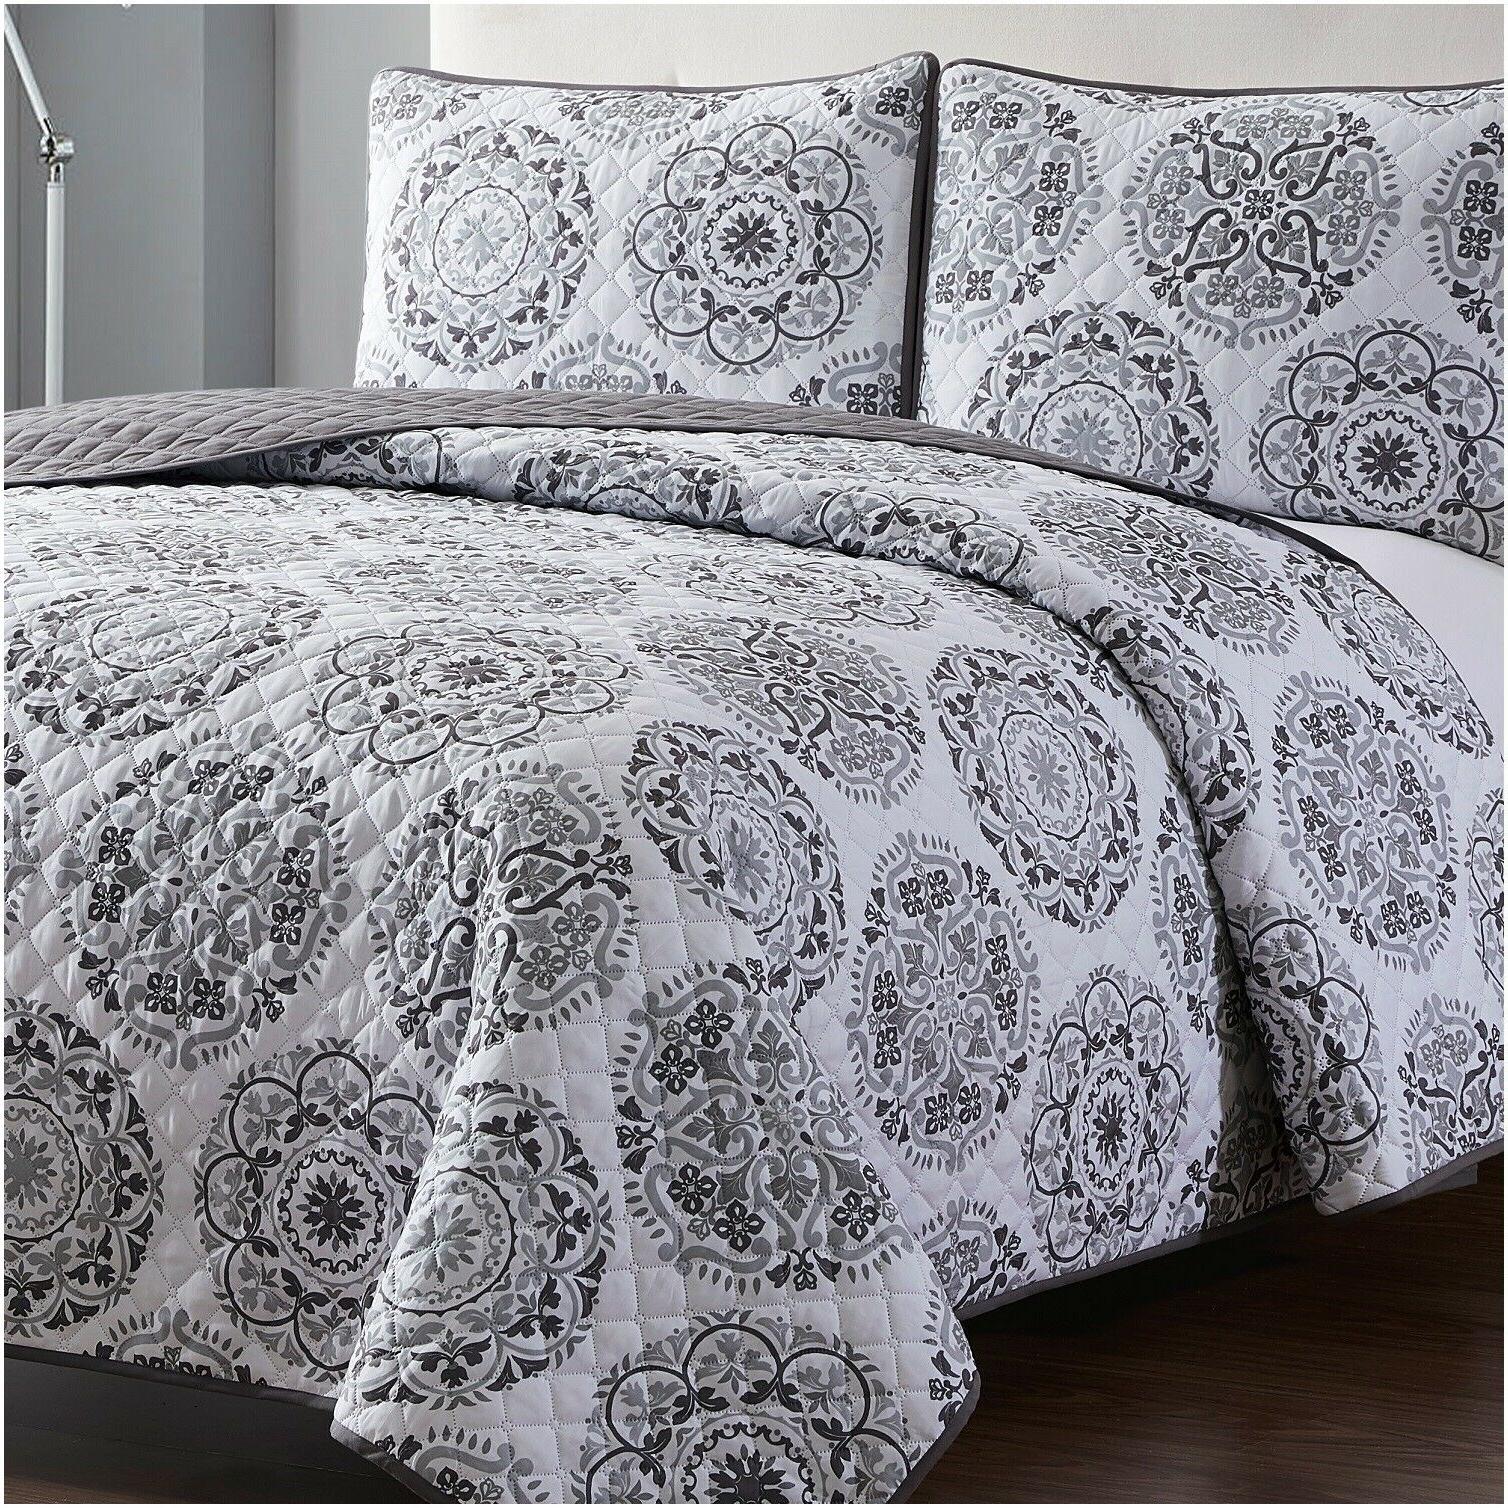 Mellanni Oversized Bedspread -